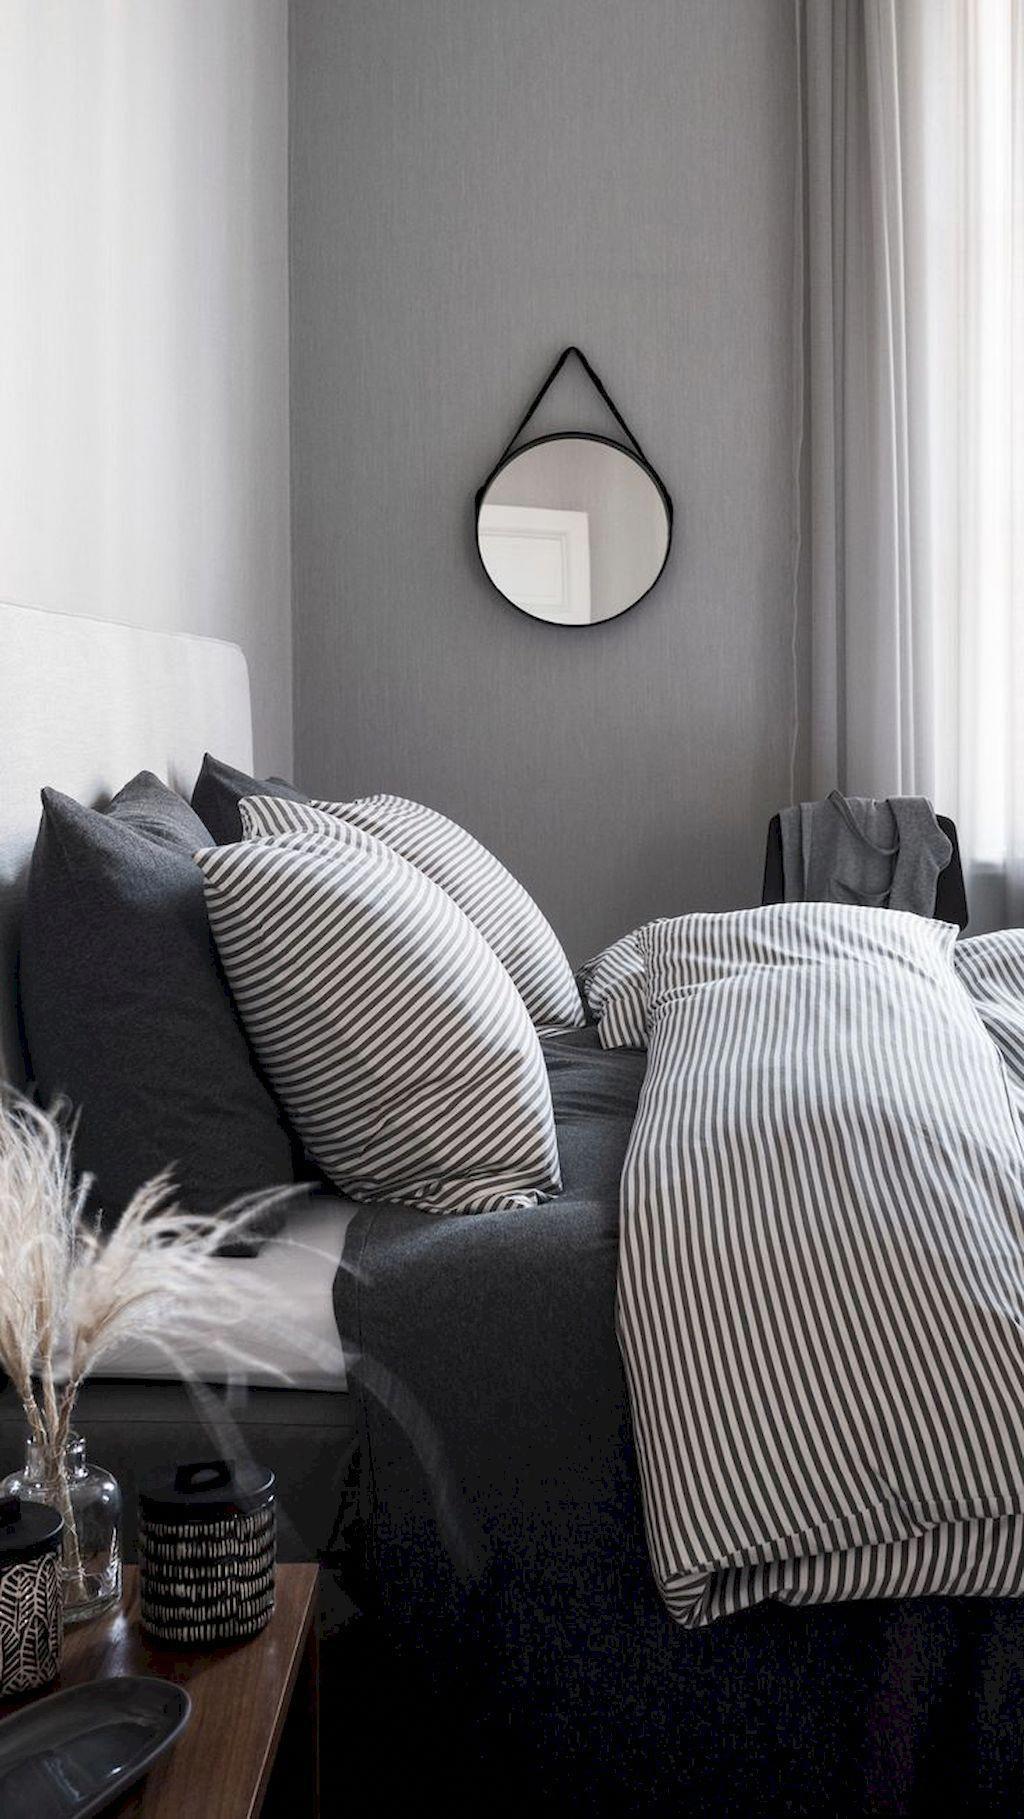 Home Decoration Accessories Ltd #HomeDecorationForSale # ...